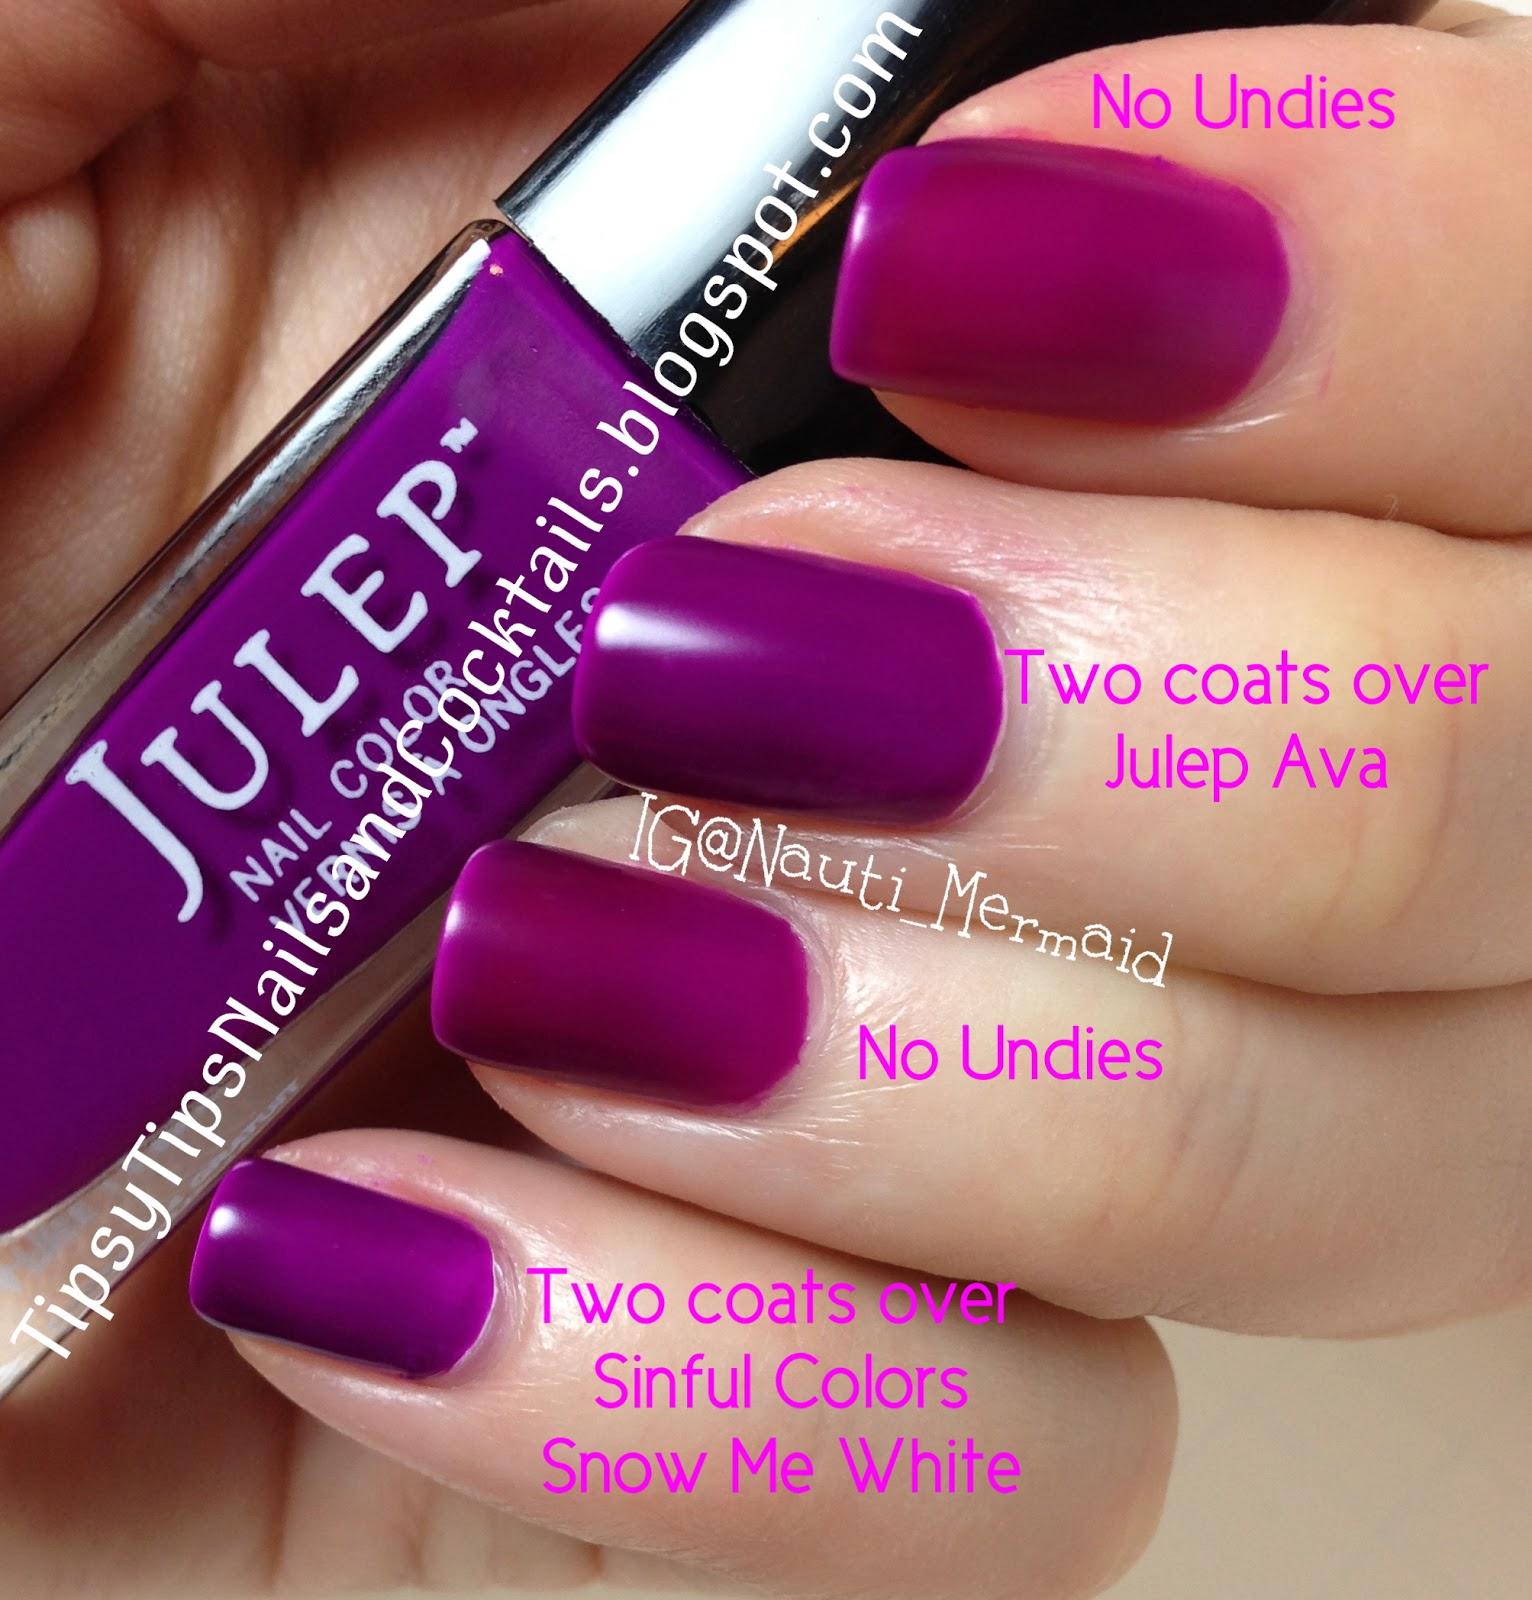 http://3.bp.blogspot.com/-8TZVpzg-Ck8/UOnni6aFJcI/AAAAAAAAB8o/Ed33M7Ola58/s1600/Julep+Bette+2.JPG